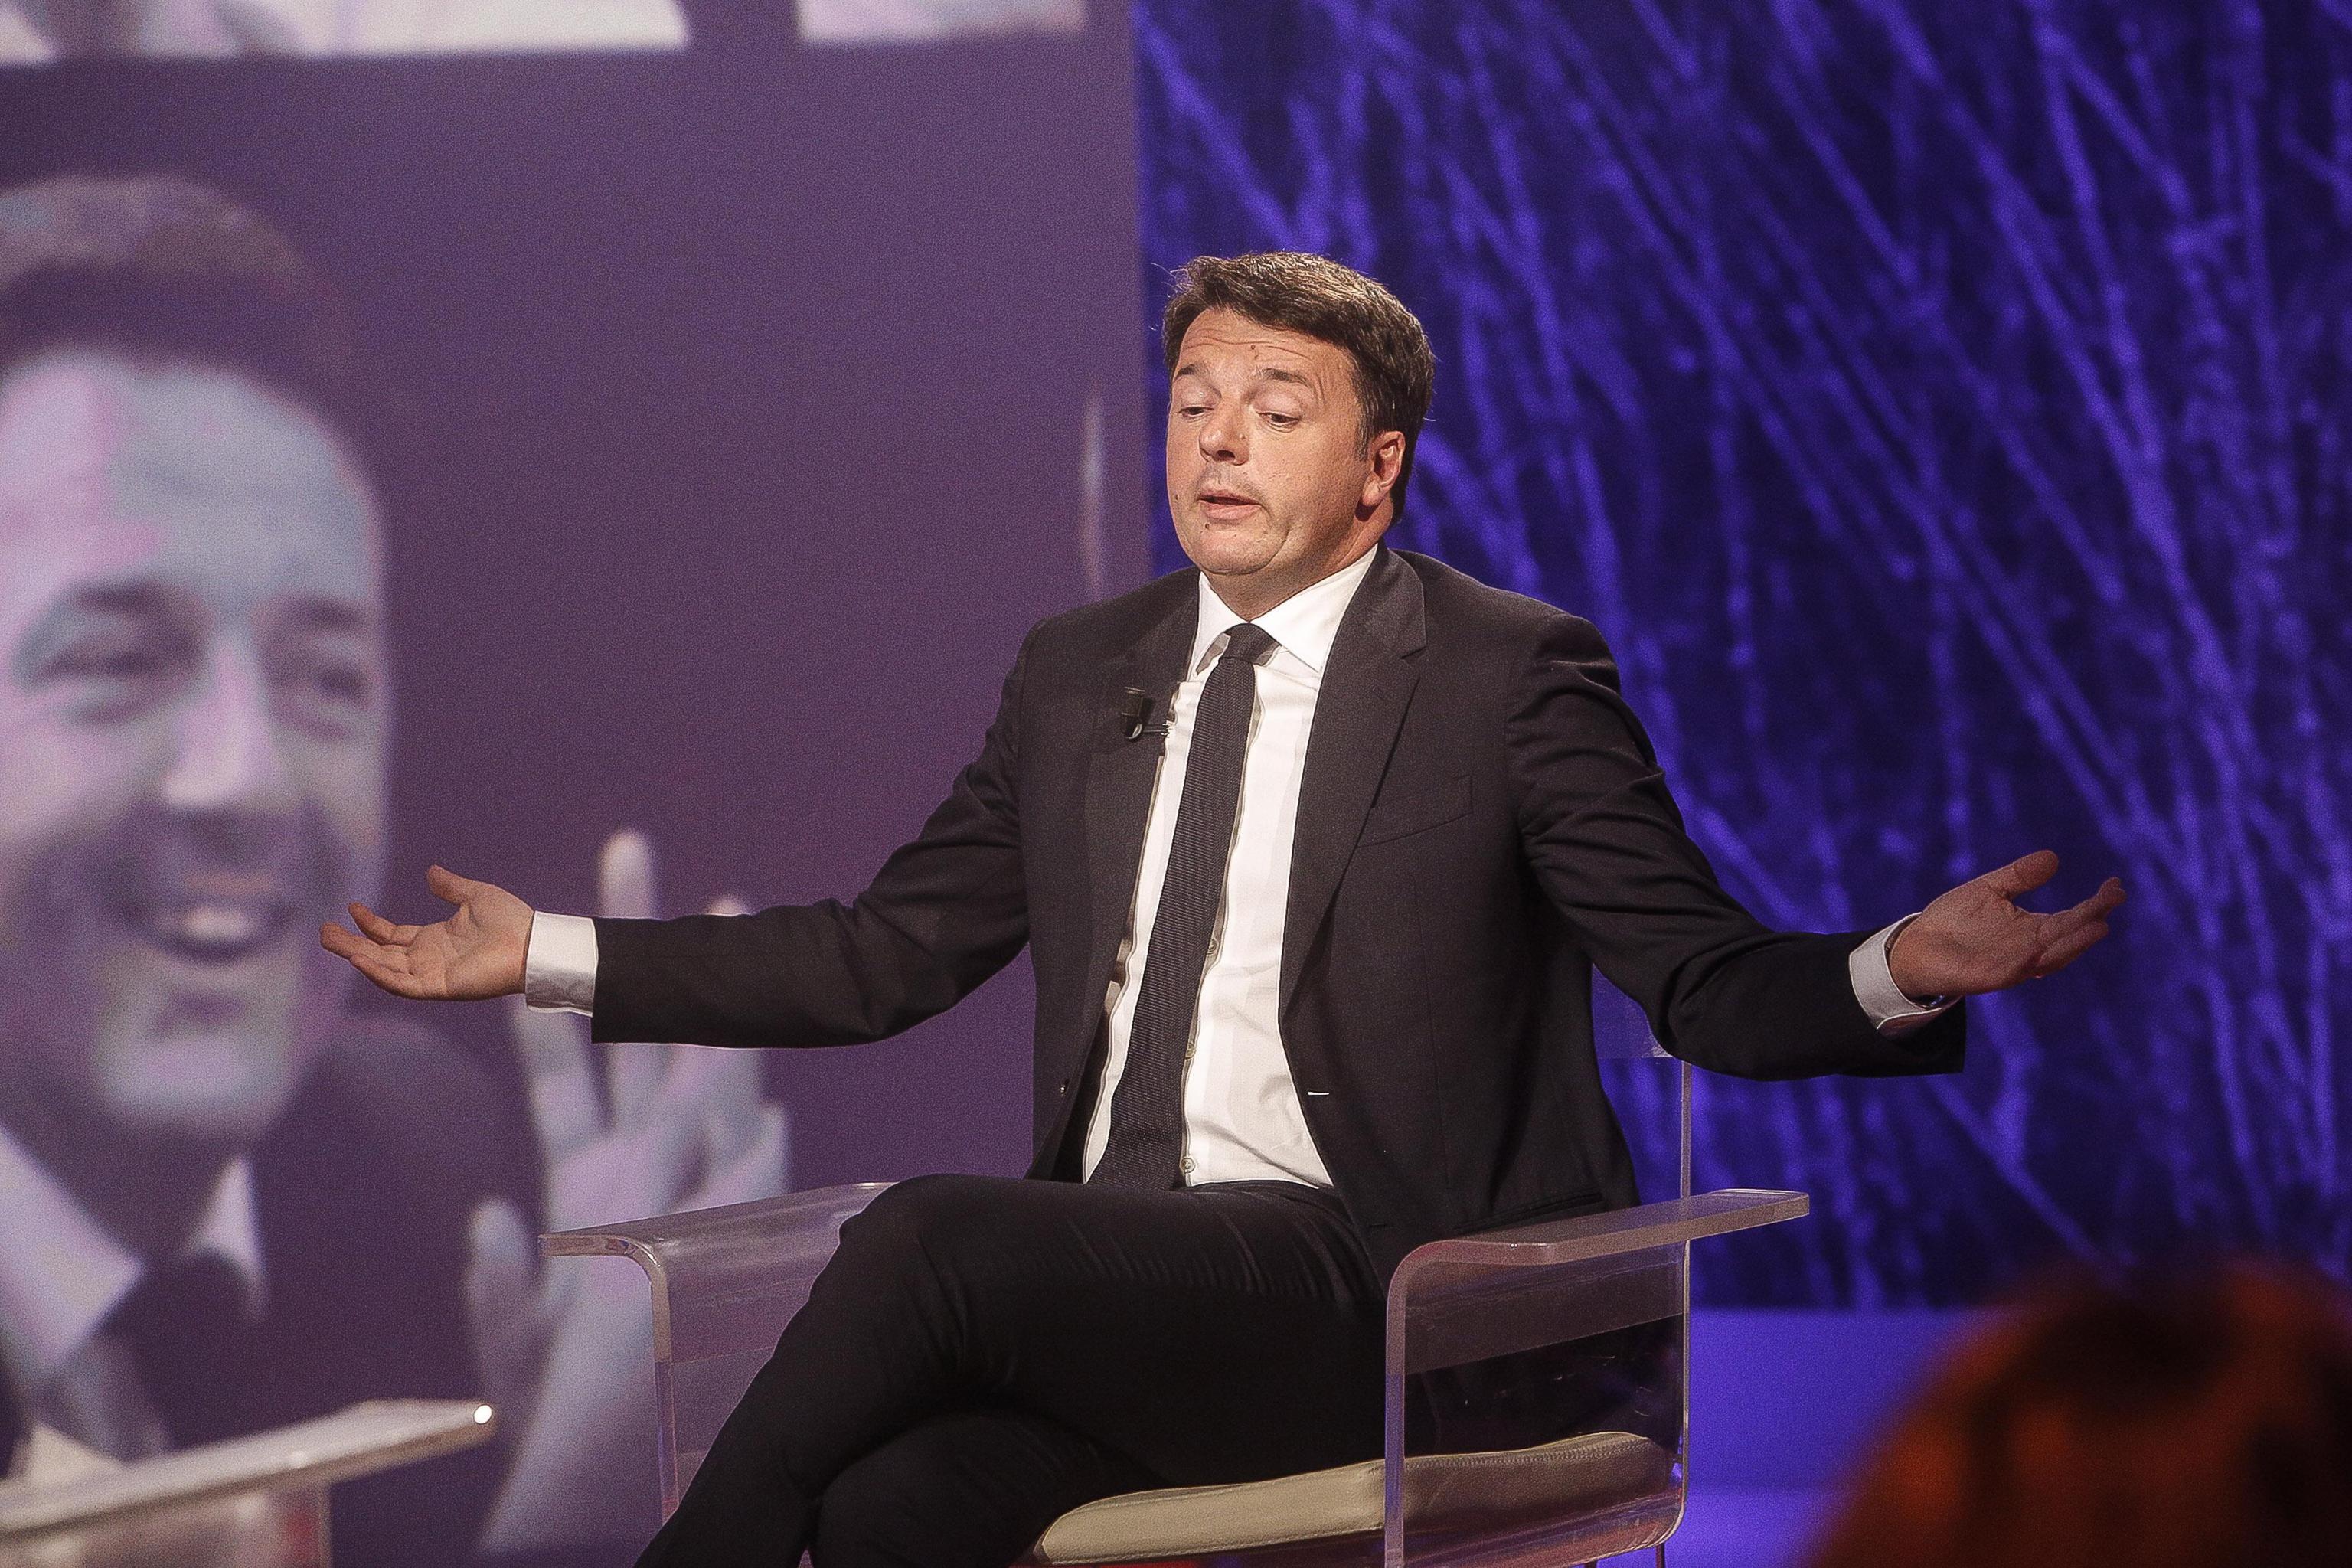 Pensioni Ape Social: caos per ritardi, ma per Renzi è un successo